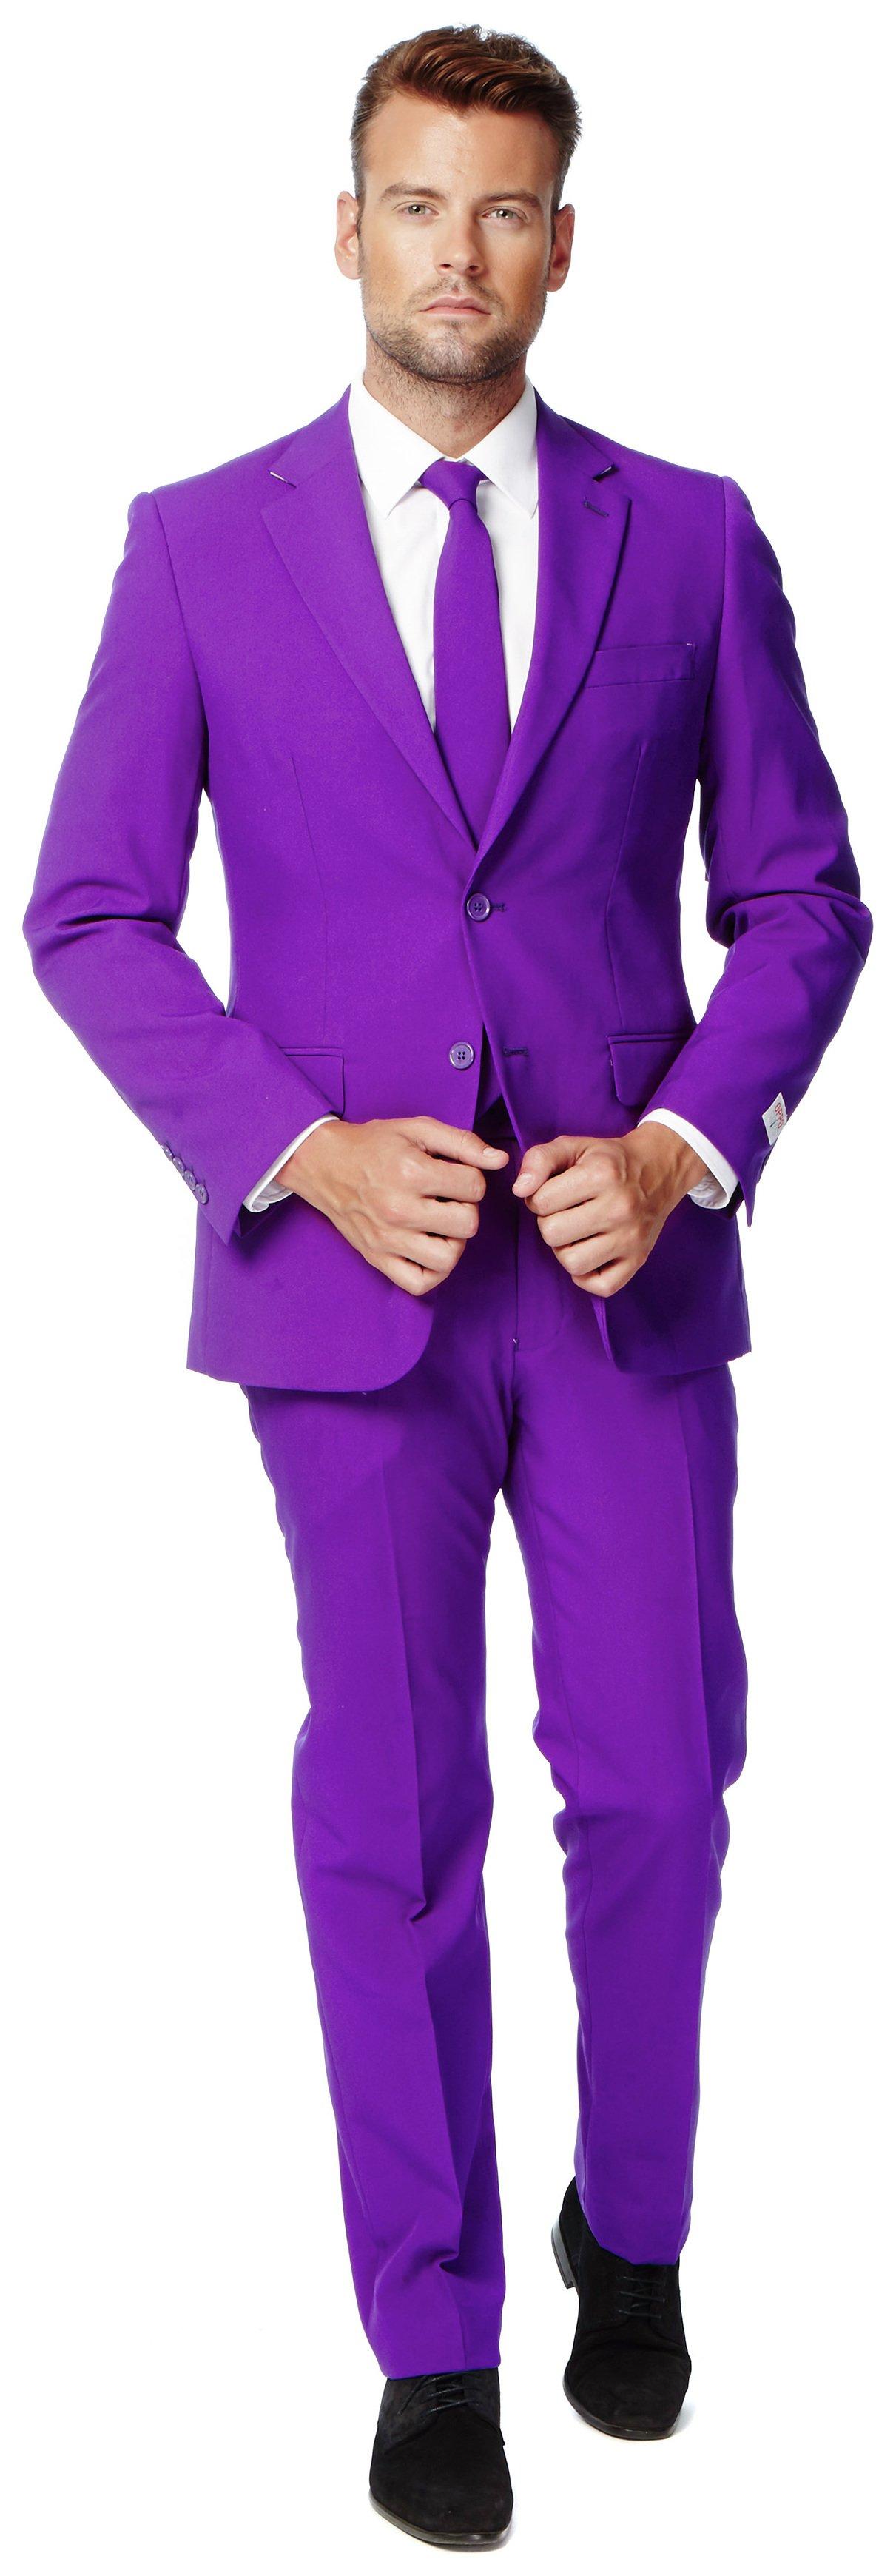 opposuit-purple-prince-suit-chest-44